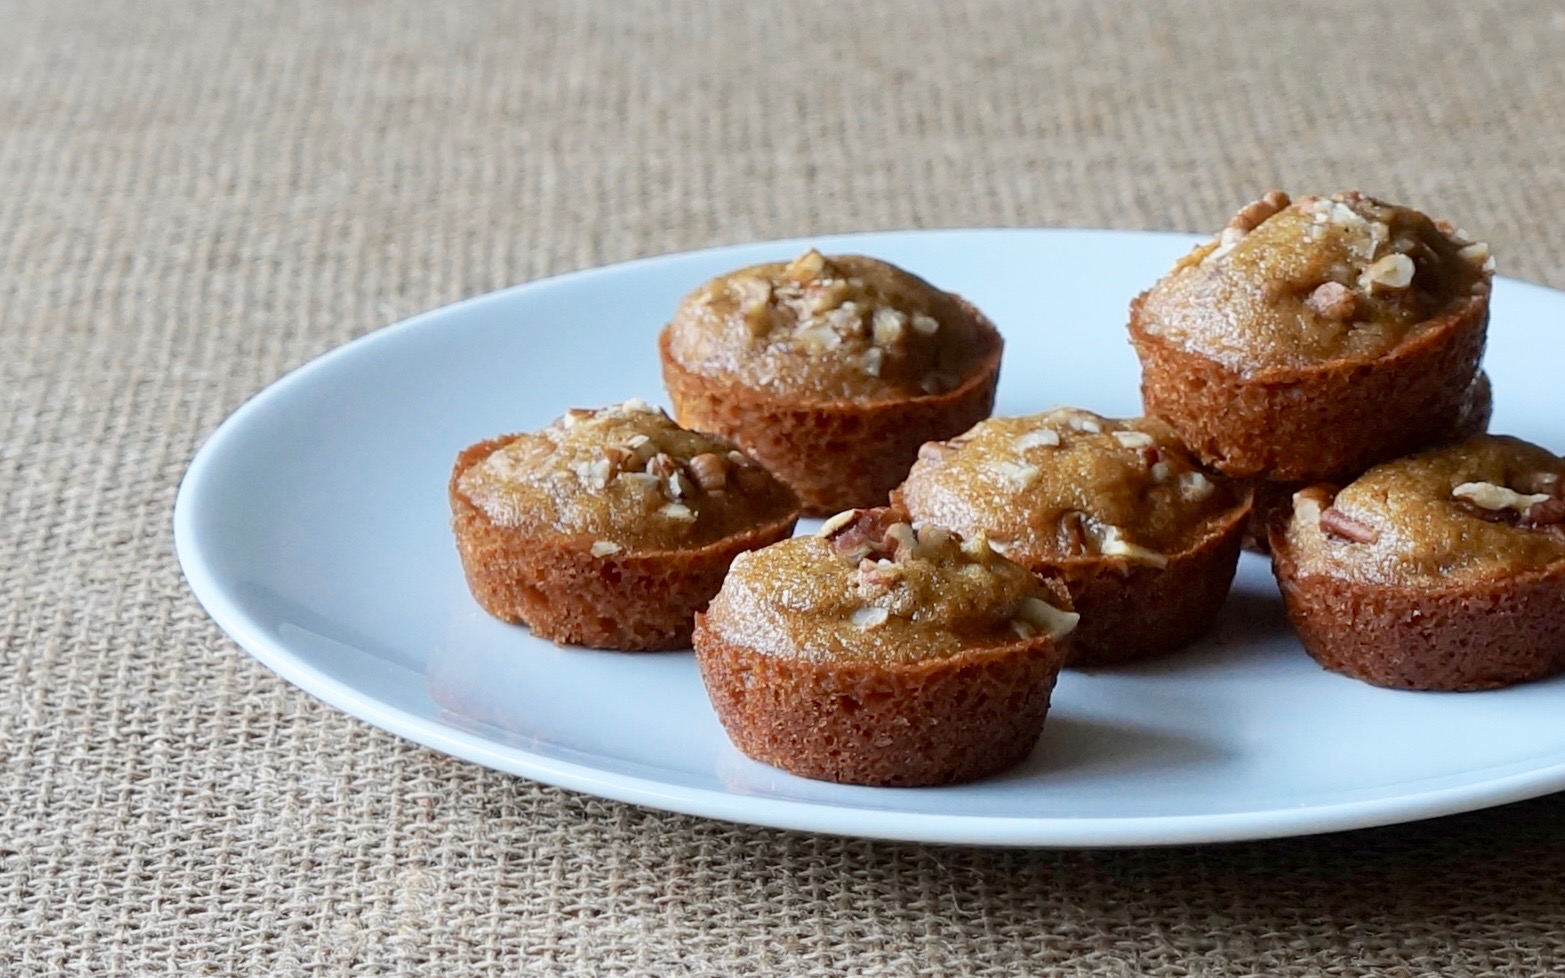 Miniature-Buttermilk-Carrot-Muffins-Rebecca-Gordon-Publisher-Buttermilk-Lipstick-Culinary-Entertaining-Techniques-Southern-Hostess-RebeccaGordon-Pastry-Chef-Birmingham-Alabama